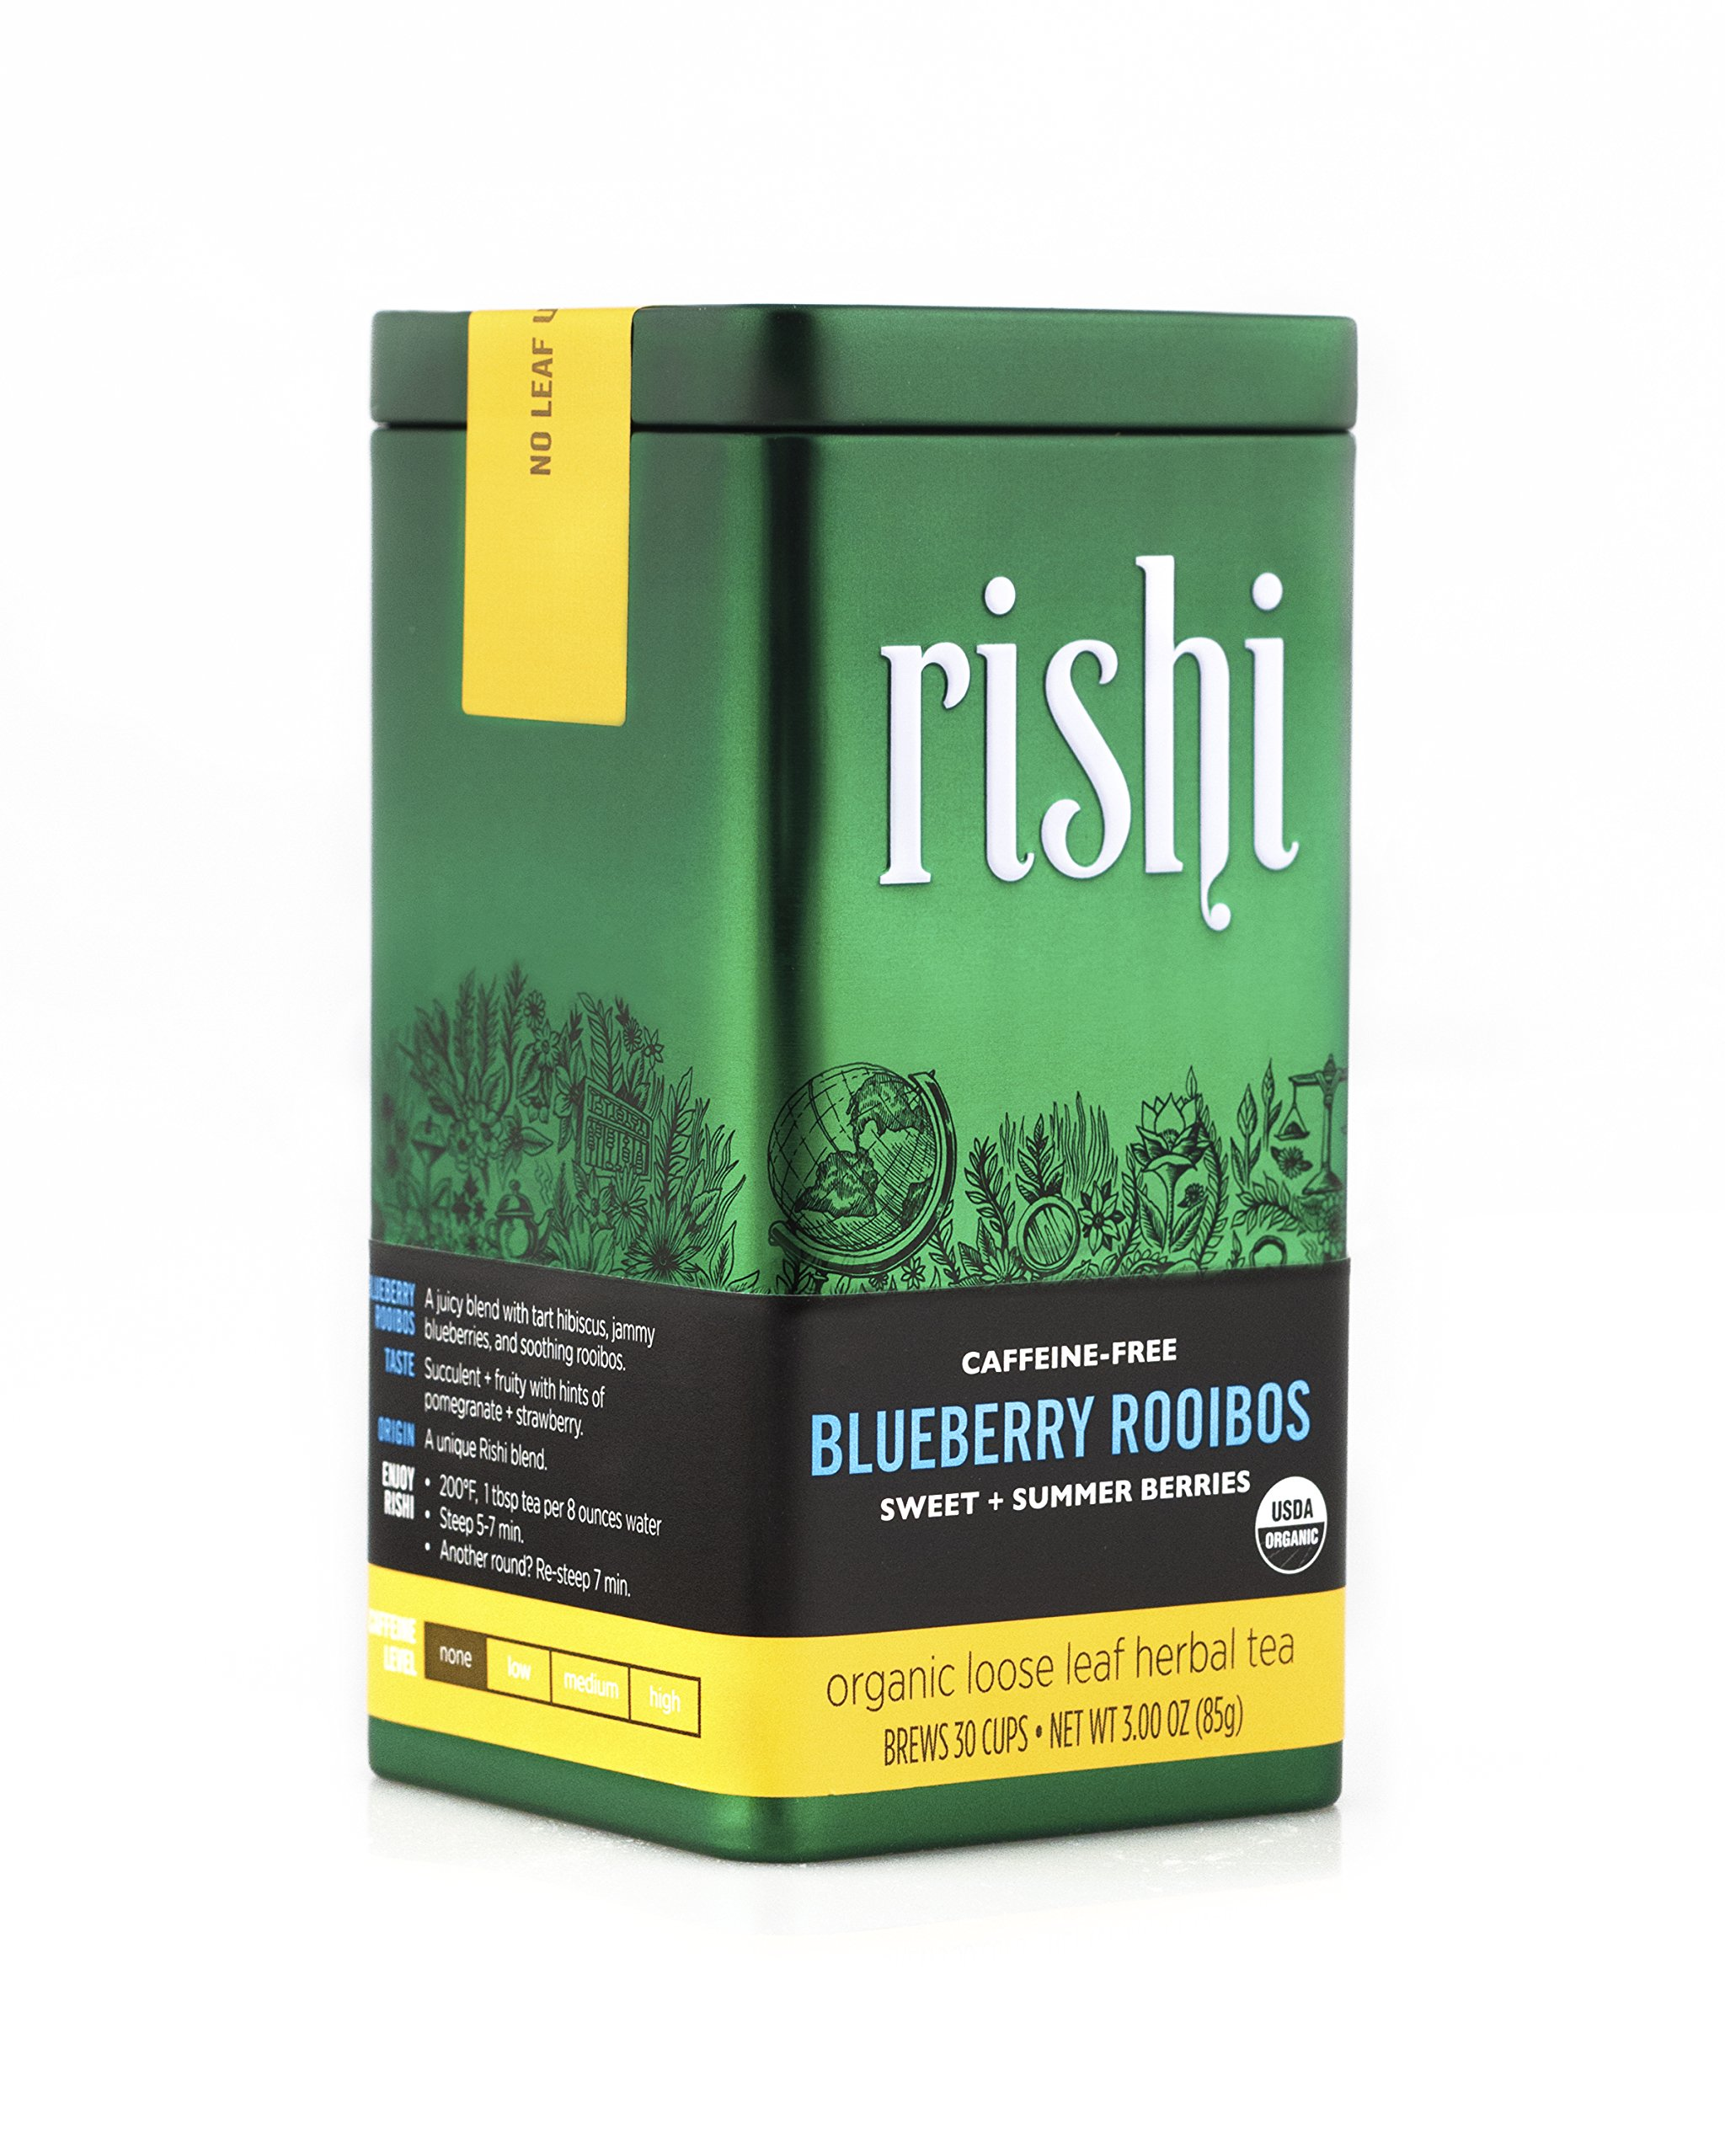 Rishi Tea Organic Blueberry Rooibos, Caffeine Free, 3 Ounce Tin by Rishi Tea